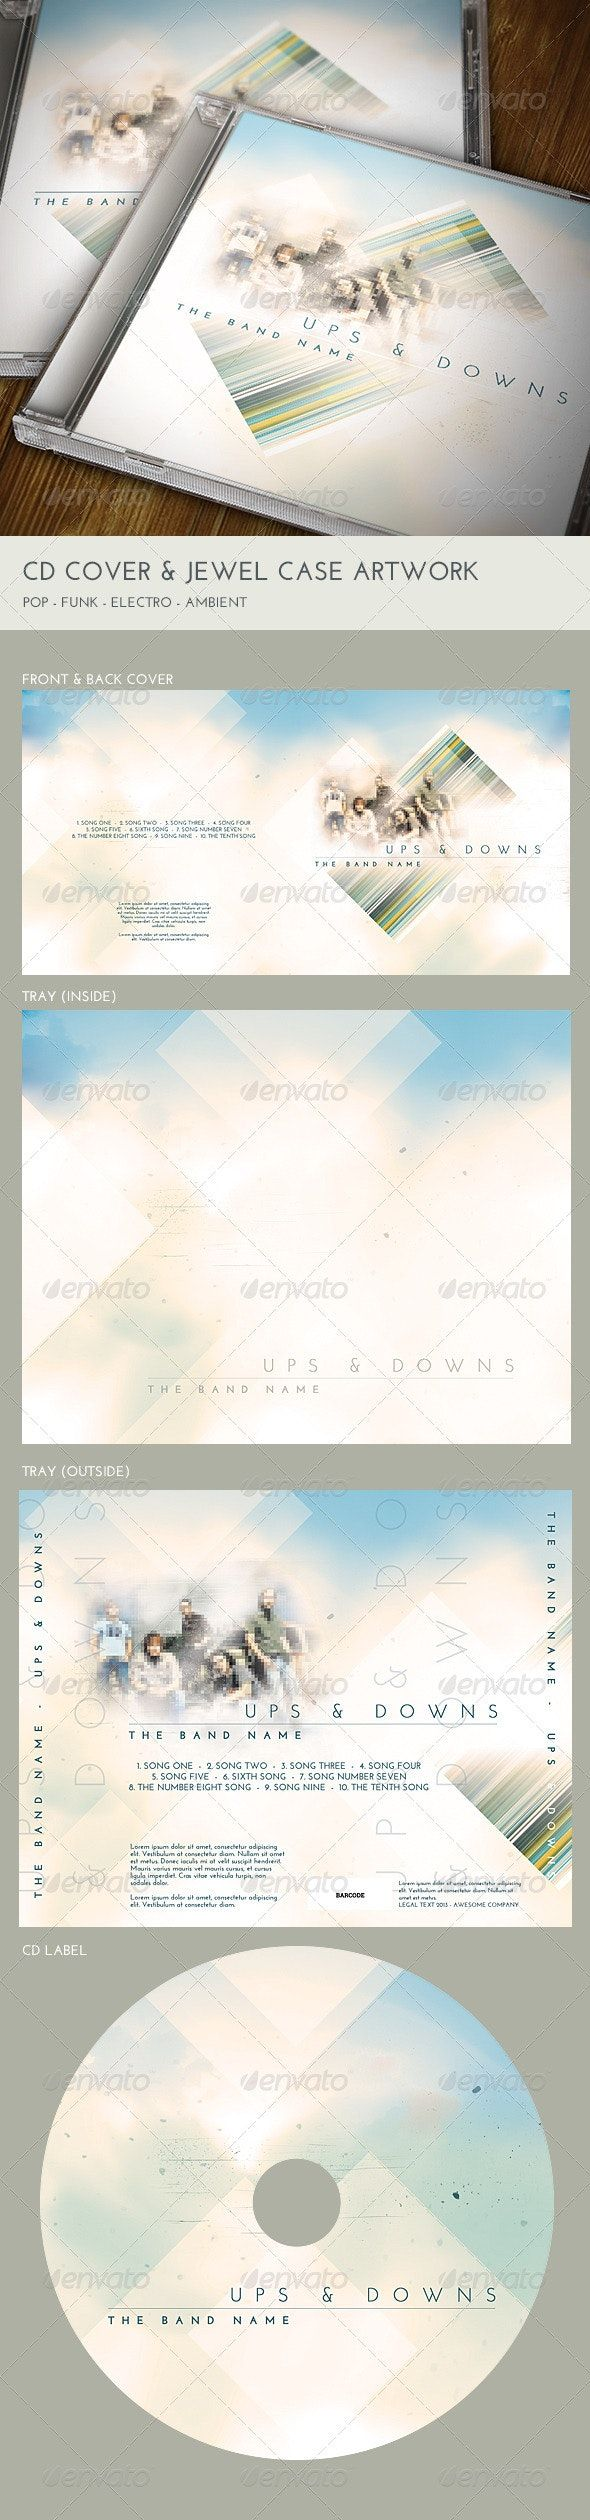 Pin On Graphics Designs Art